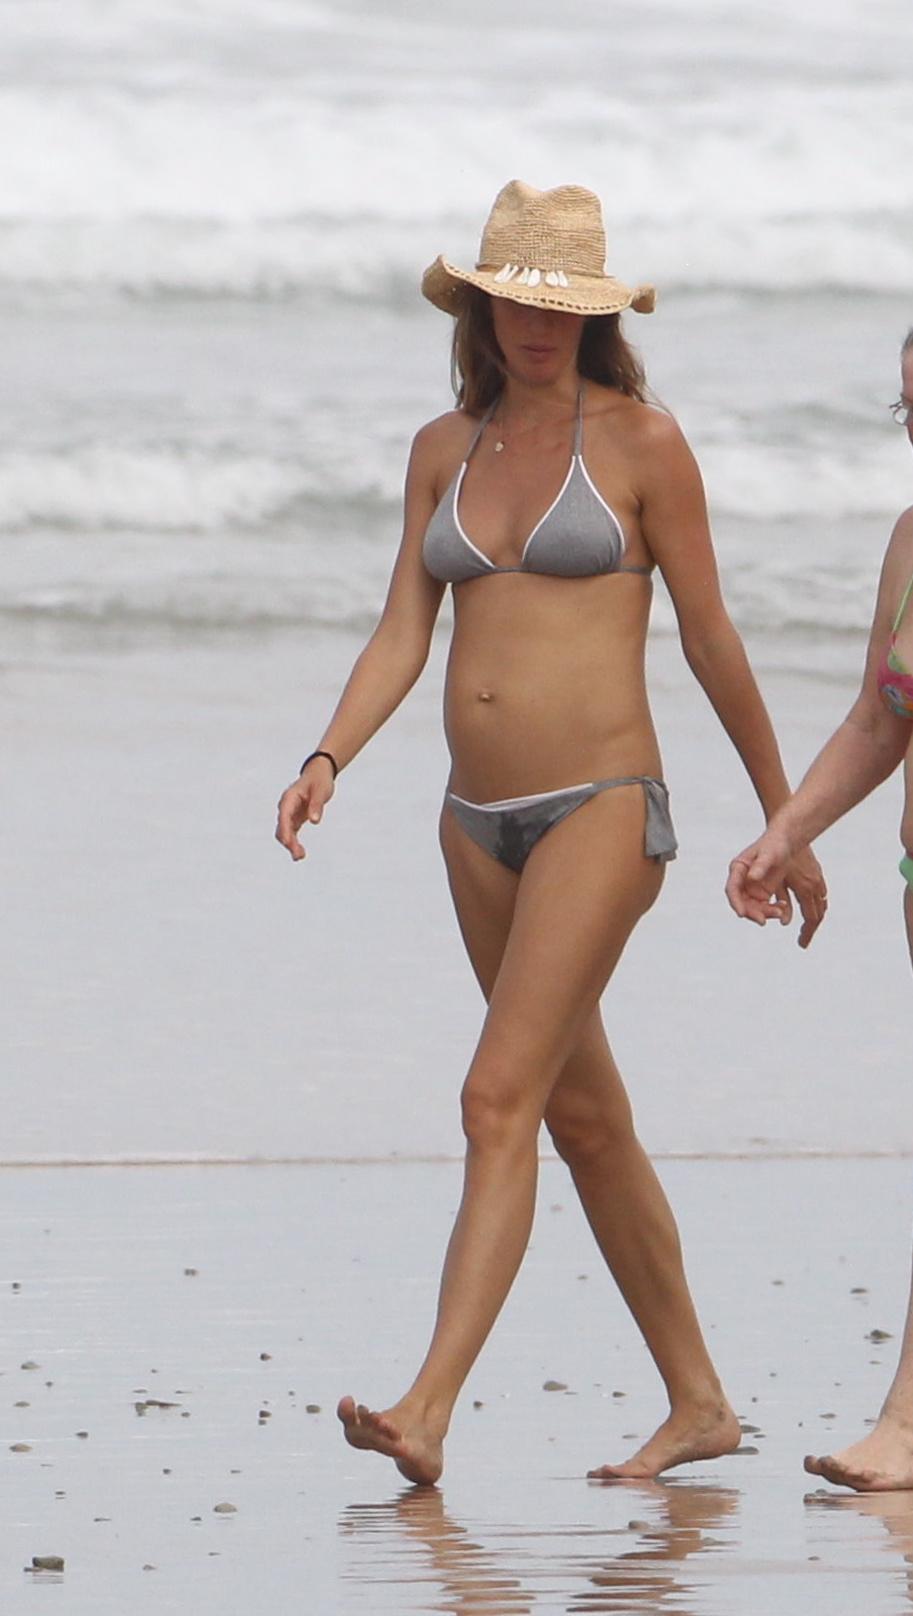 Gisele Bundchen in a Bikini